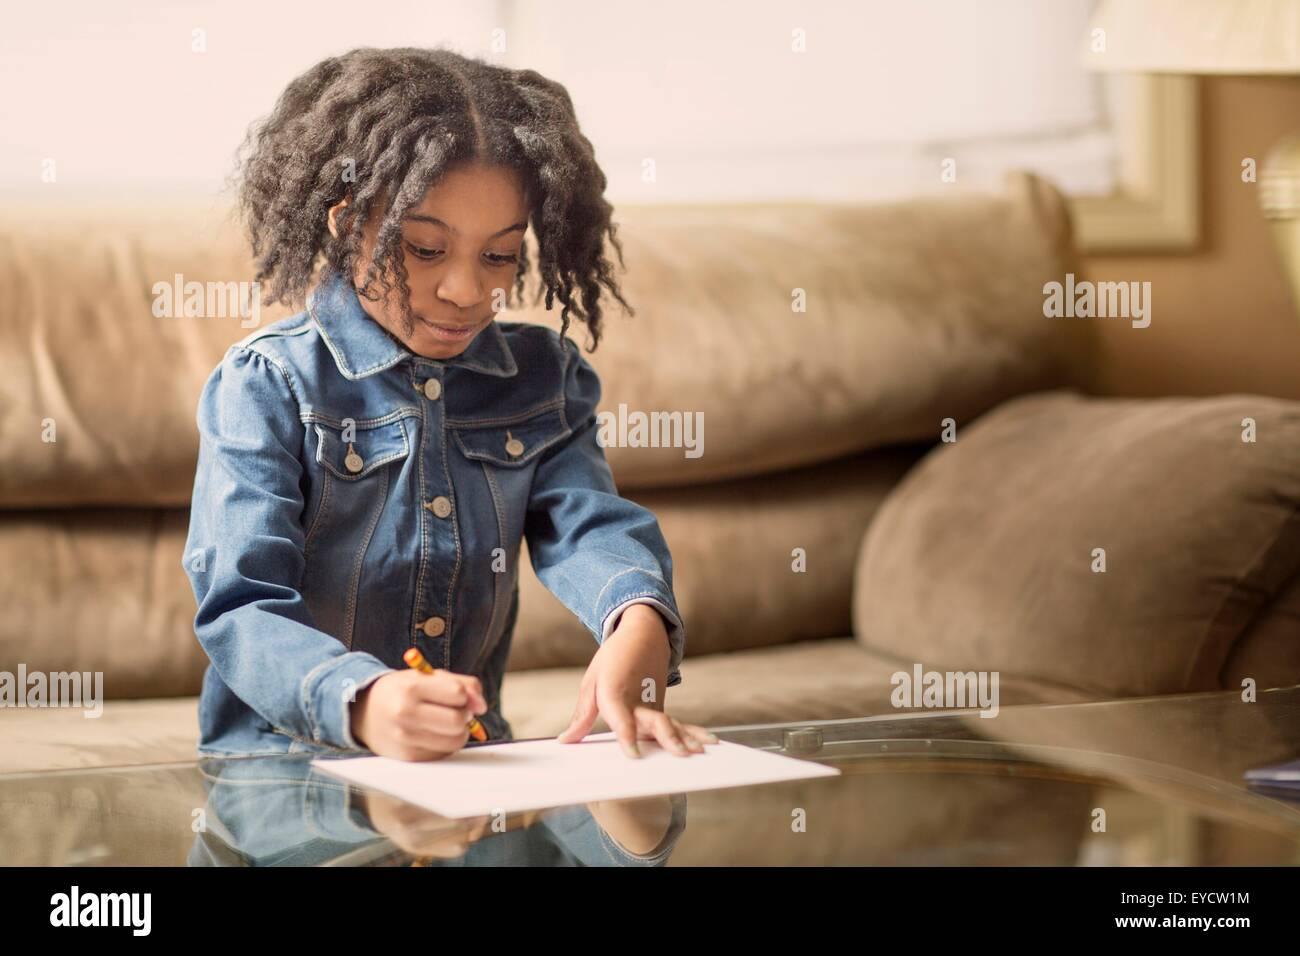 Dibujo de chica en mesa de café Imagen De Stock